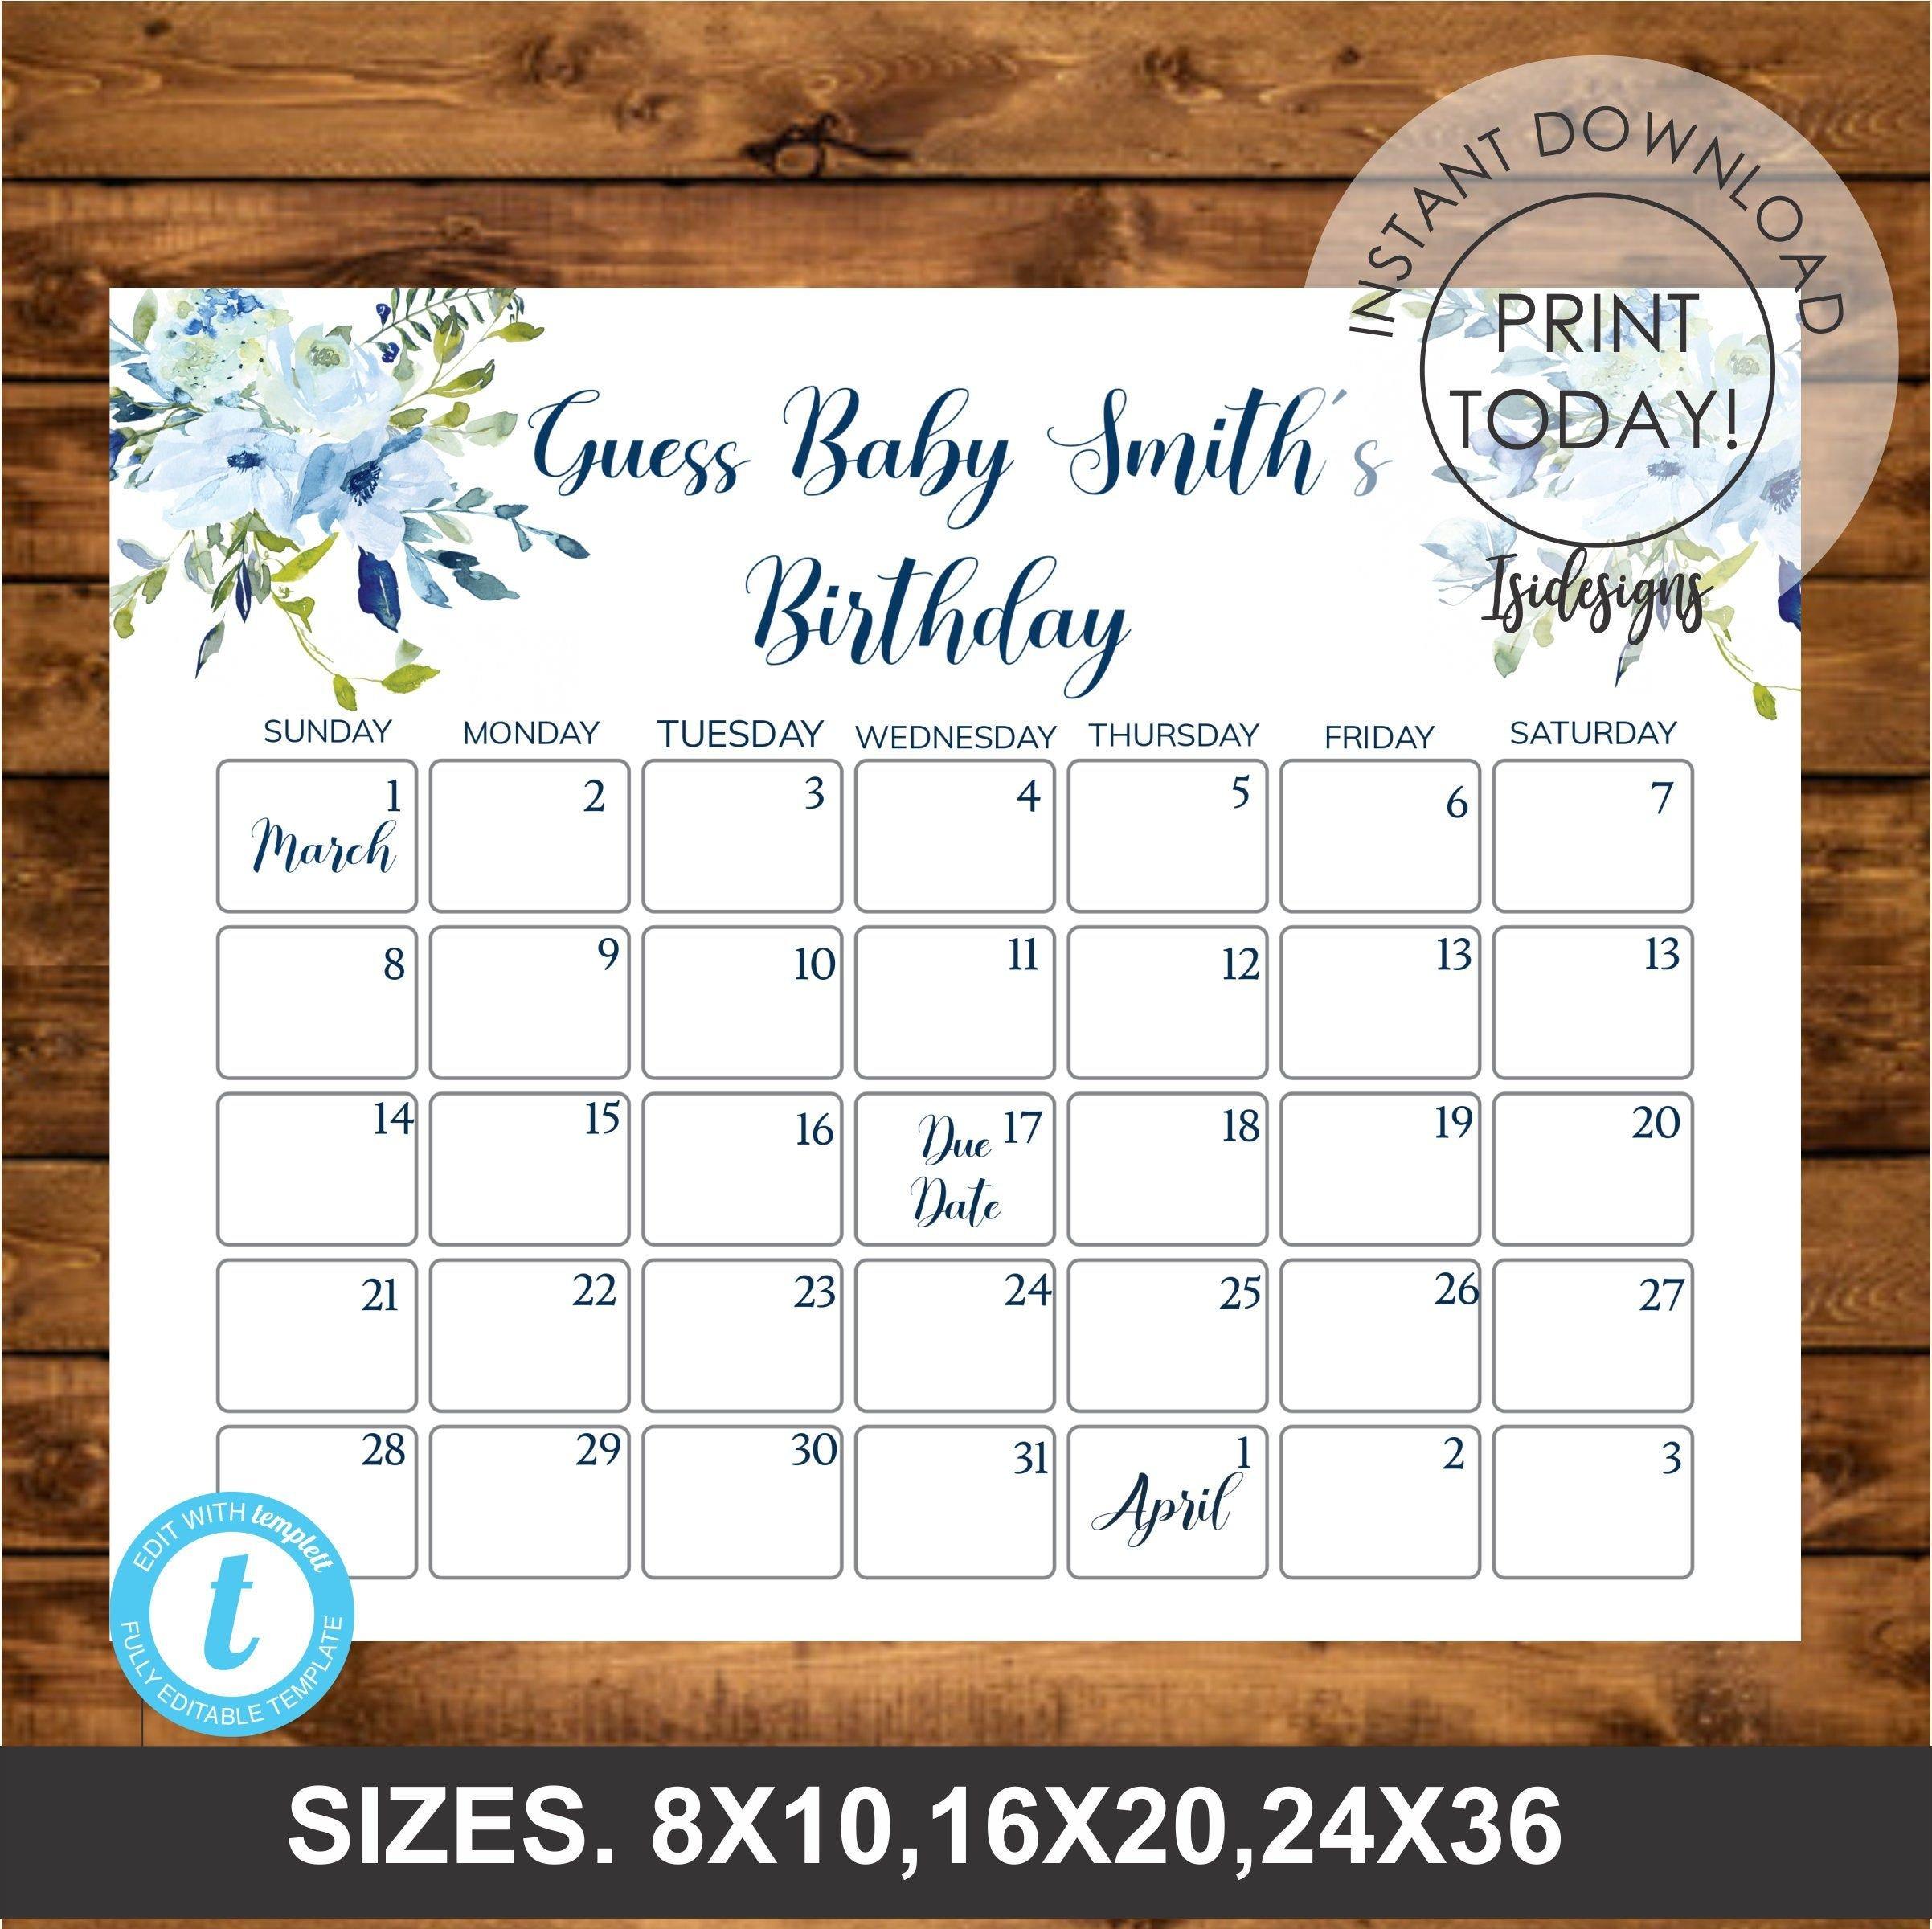 Blue Floral Editable Due Date Calendar, Guess Baby Free Editable Birthday Calendar